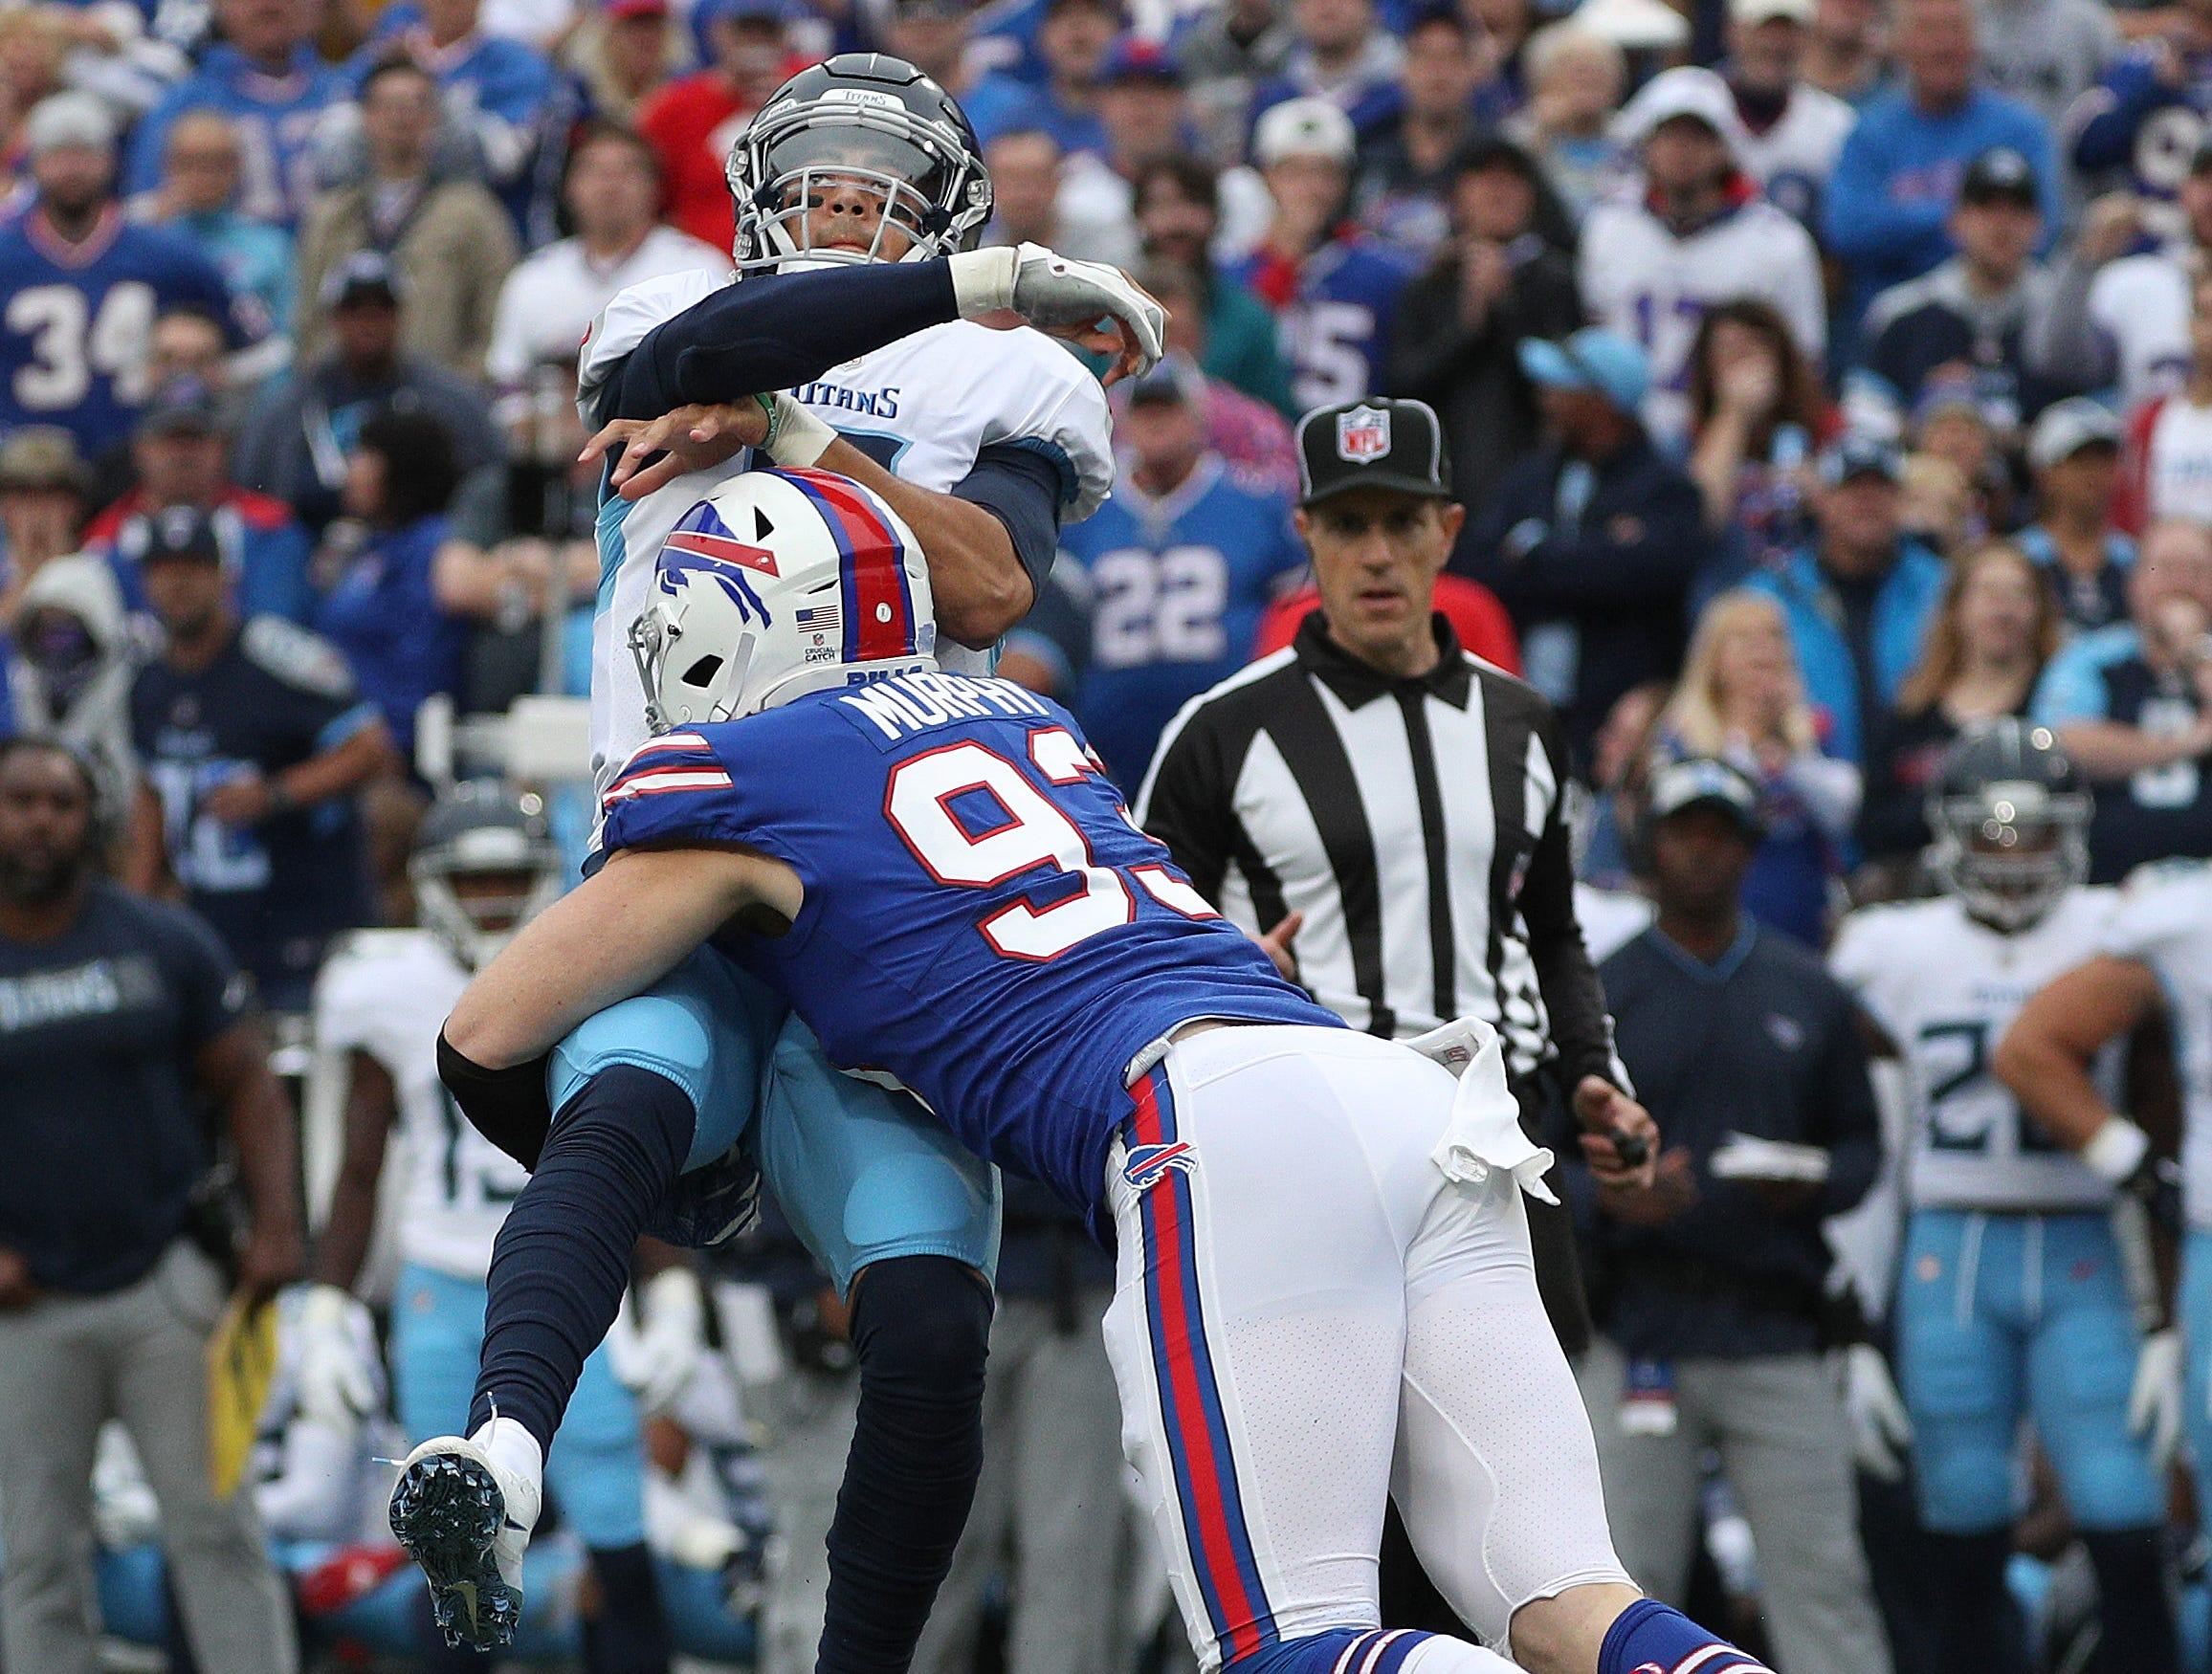 Bills Trent Murphy  hits Titans quarterback Marcus Mariota as he releases the ball.